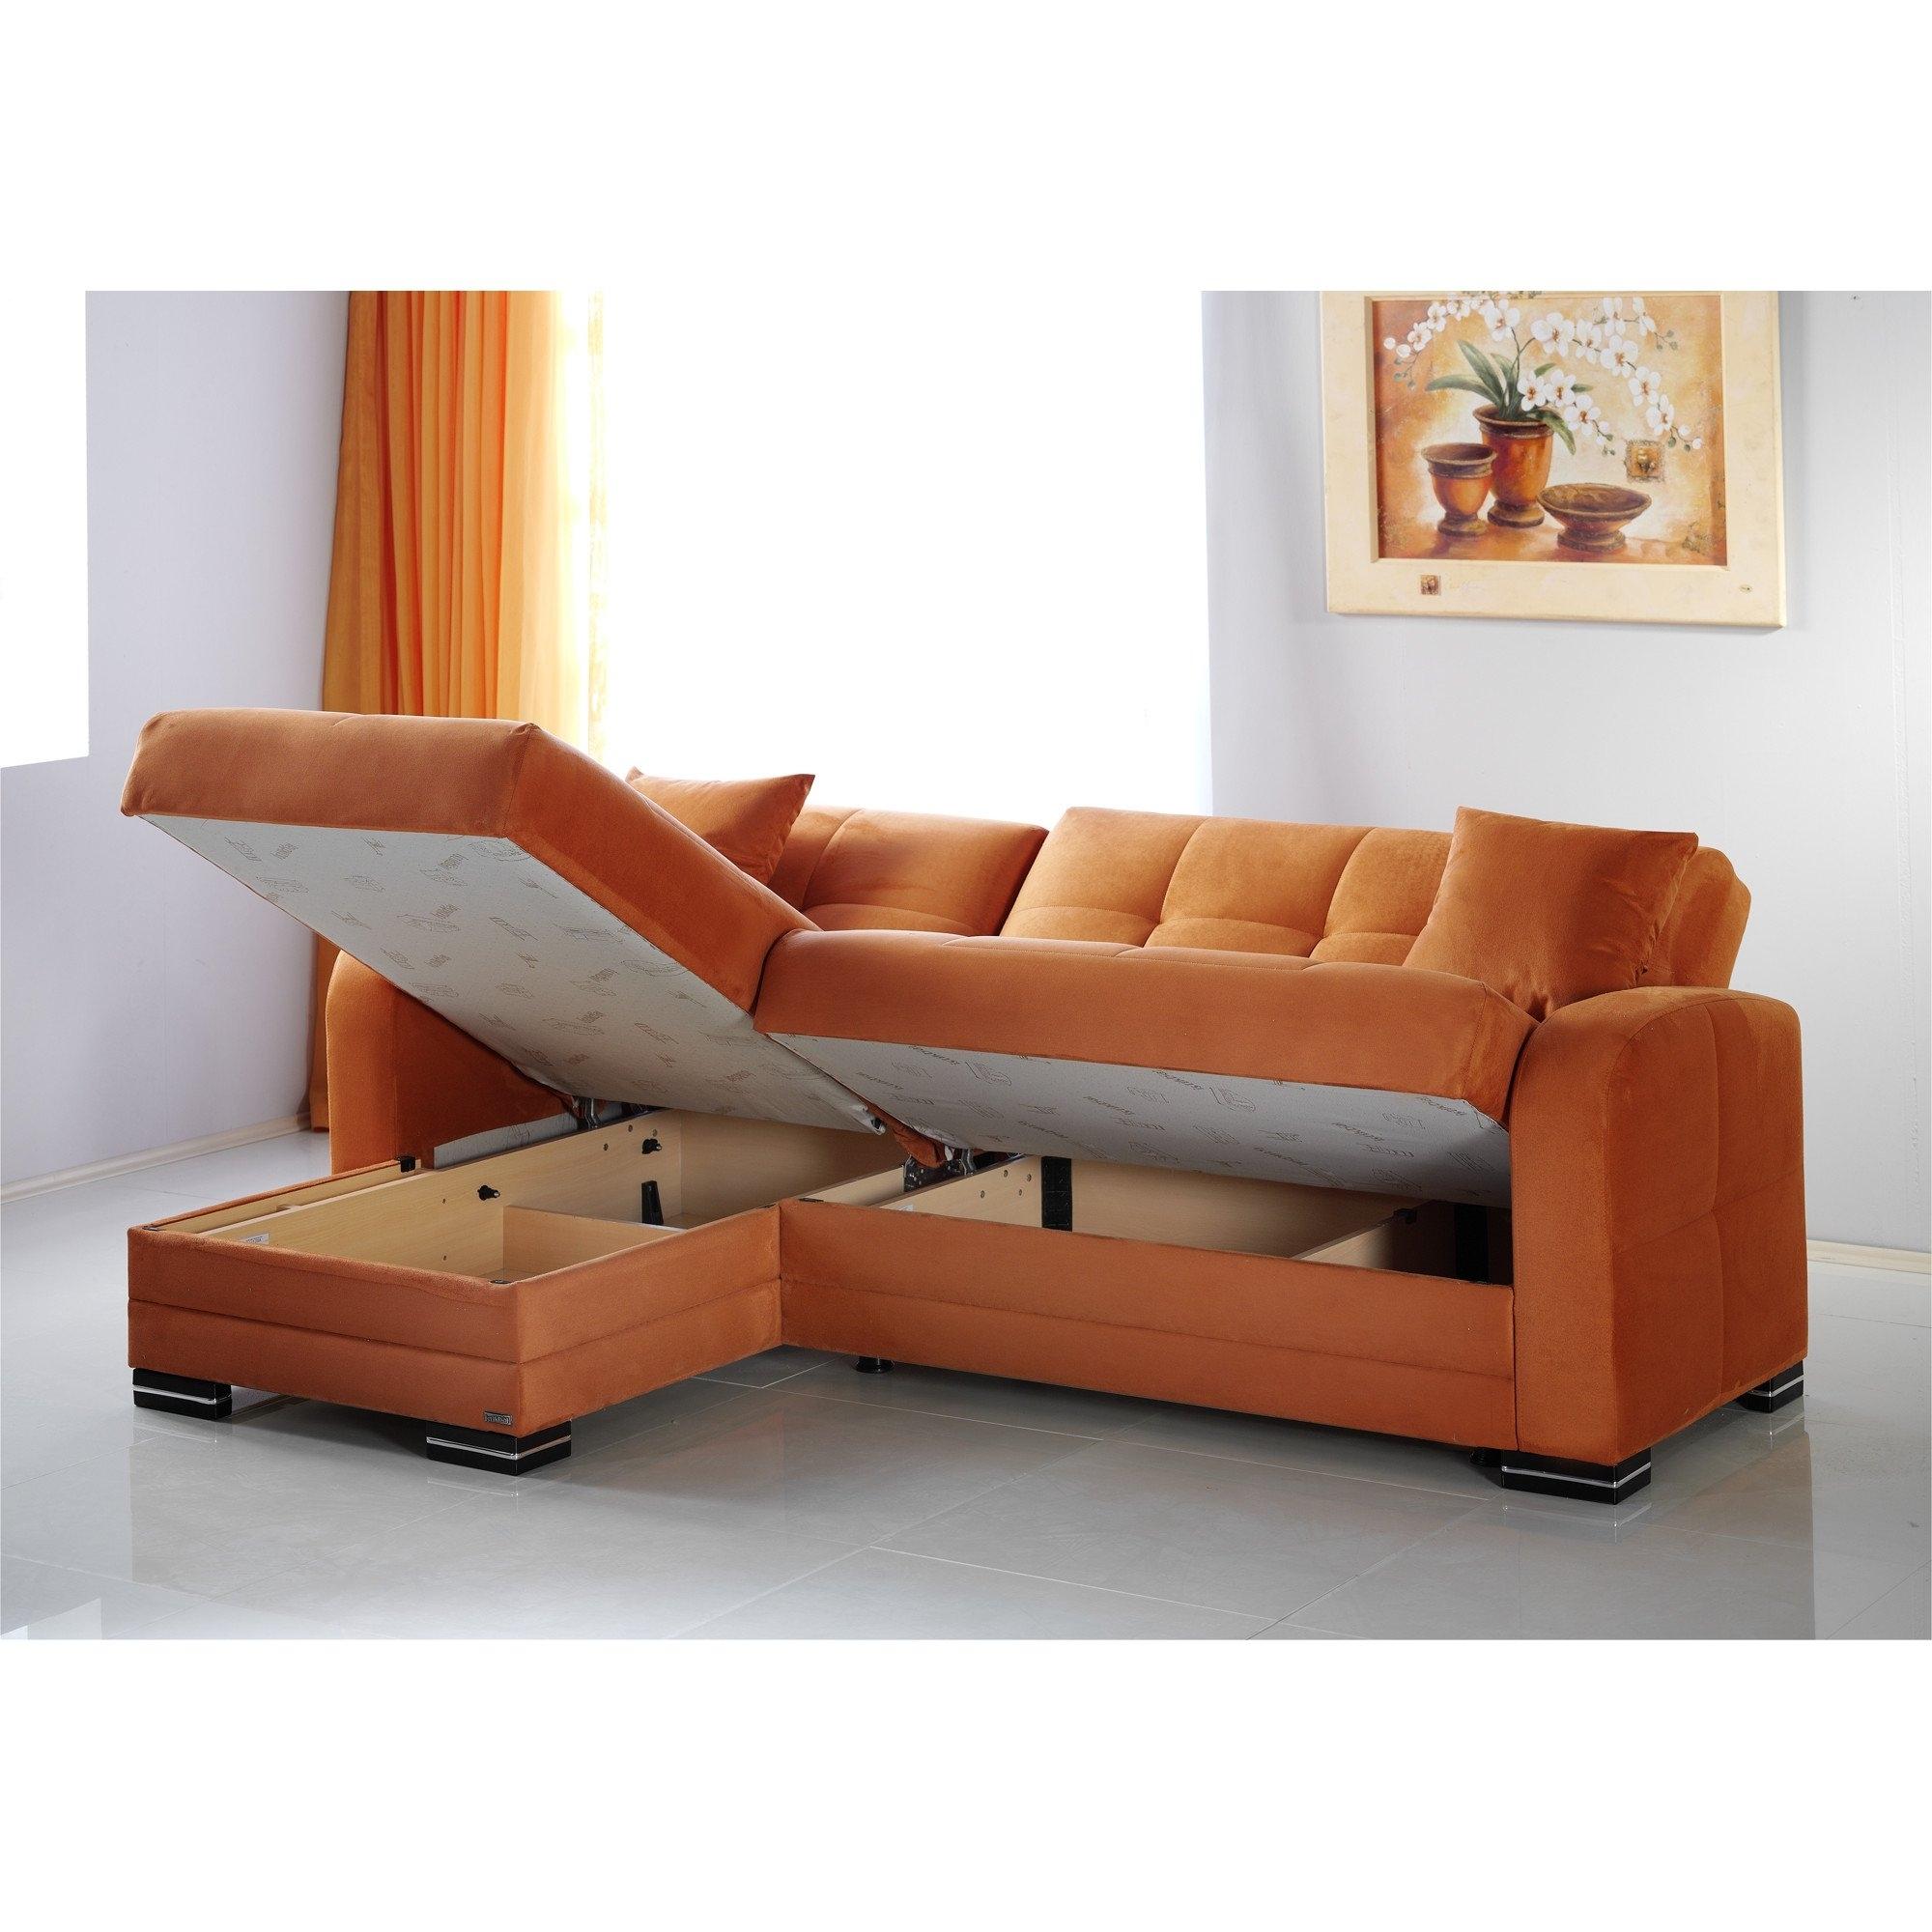 Preferred Kubo Rainbow Orange Sectional Sofasunset Regarding Reversible Chaise Sofas (View 7 of 15)